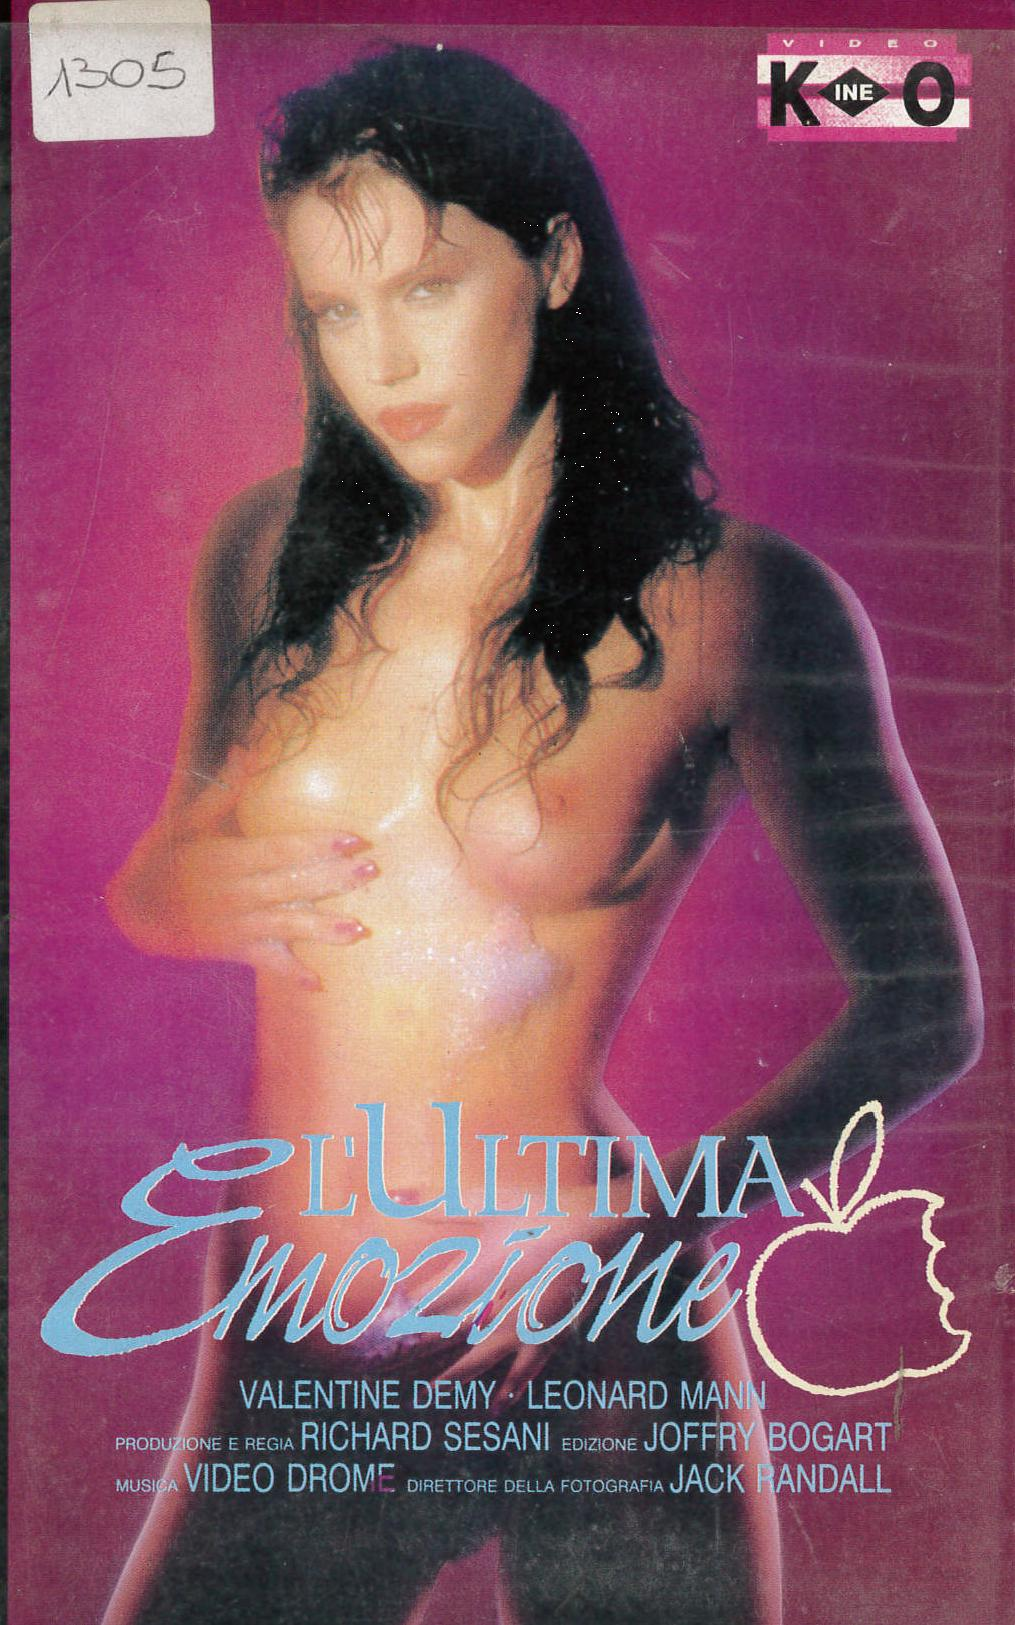 L'ULTIMA EMOZIONE - VHS EX NOLEGGIO (VHS)